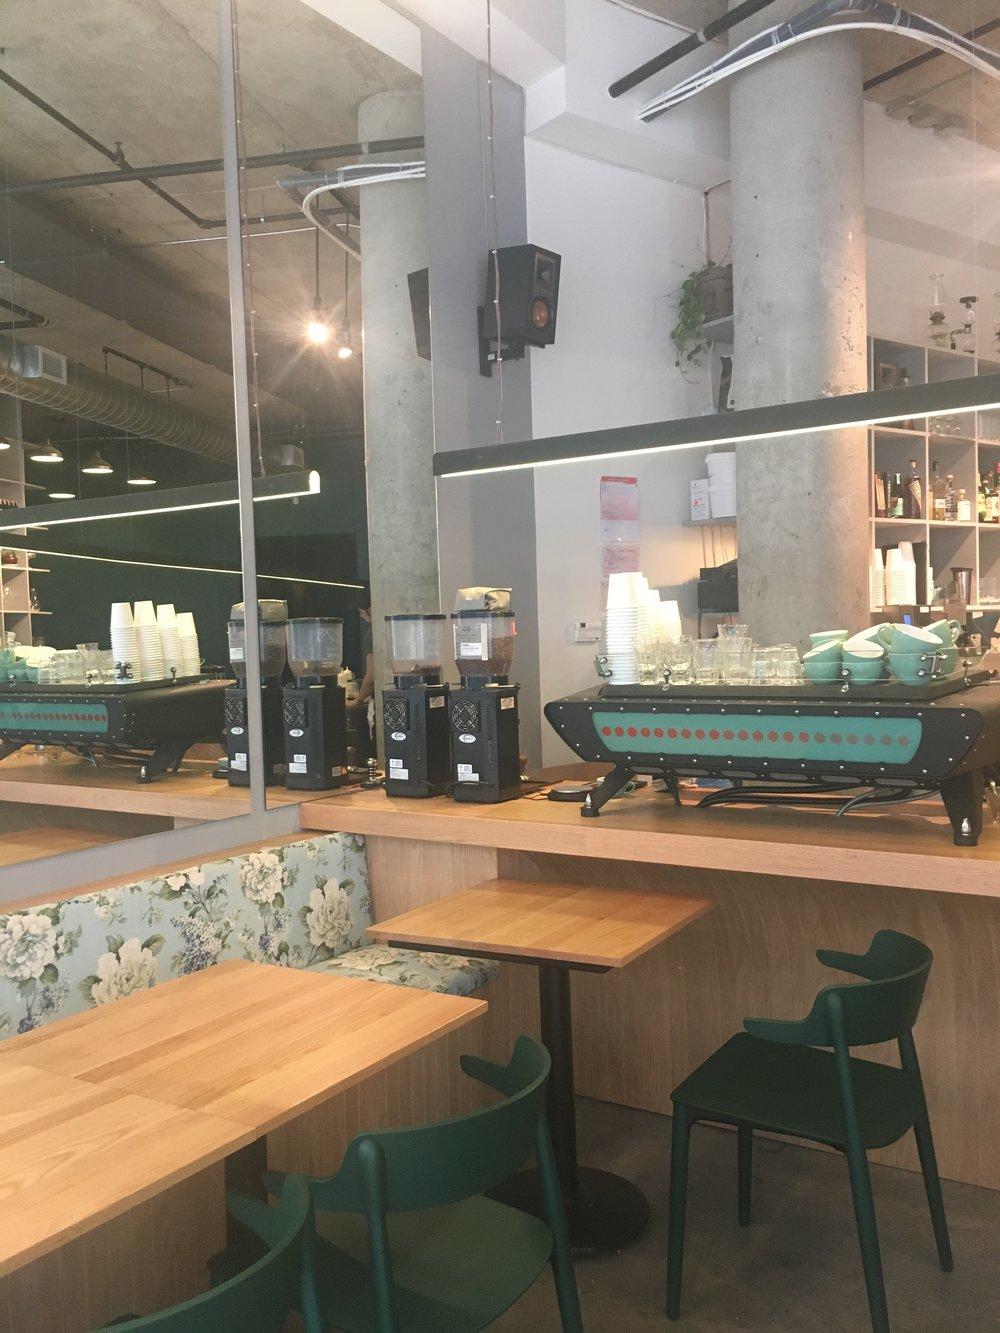 monopole cafe, restaurants montreal, new restaurants montreal, nouveaux restaurants montreal, melisse restaurant, hà vieux montréal, miel restaurant